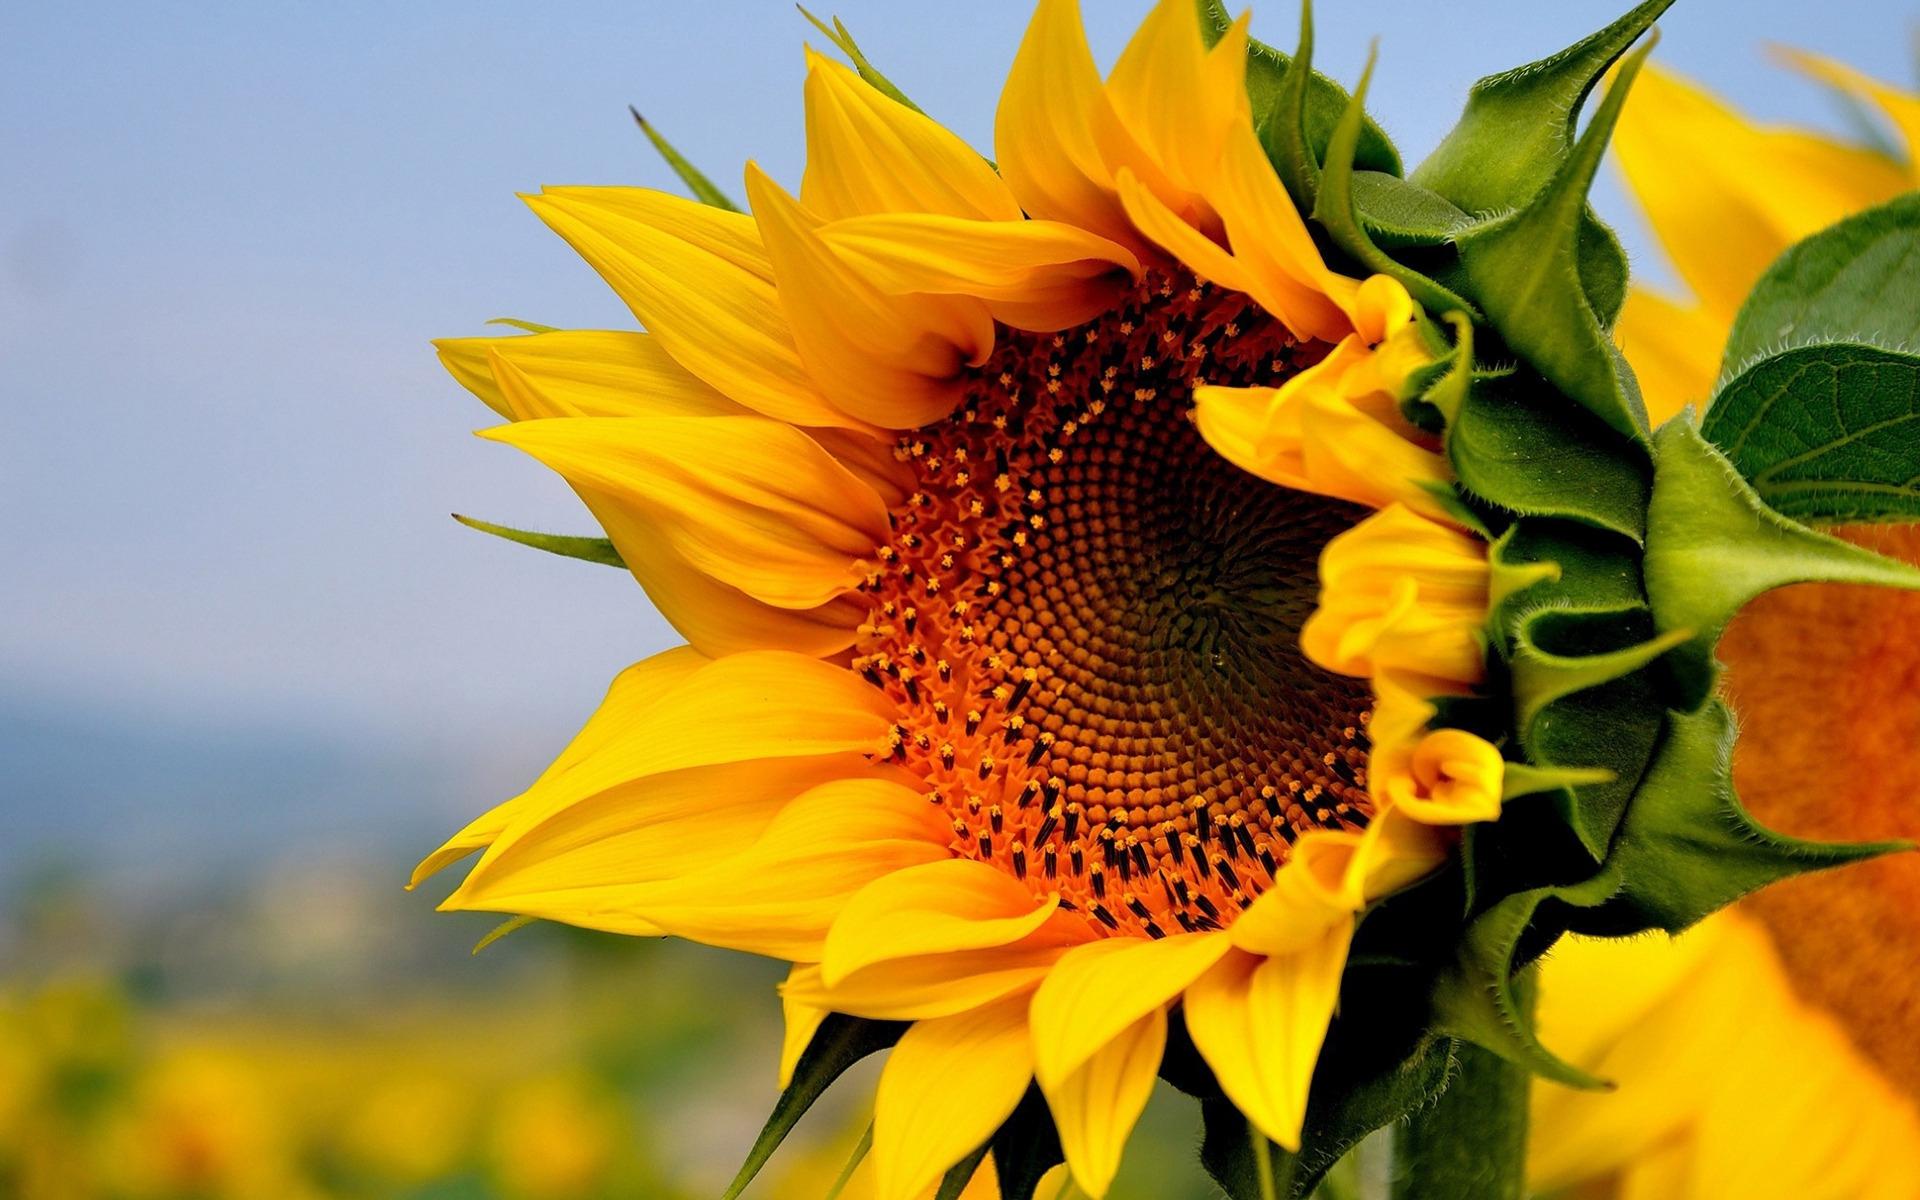 Sunflower High Definition Wallpapers